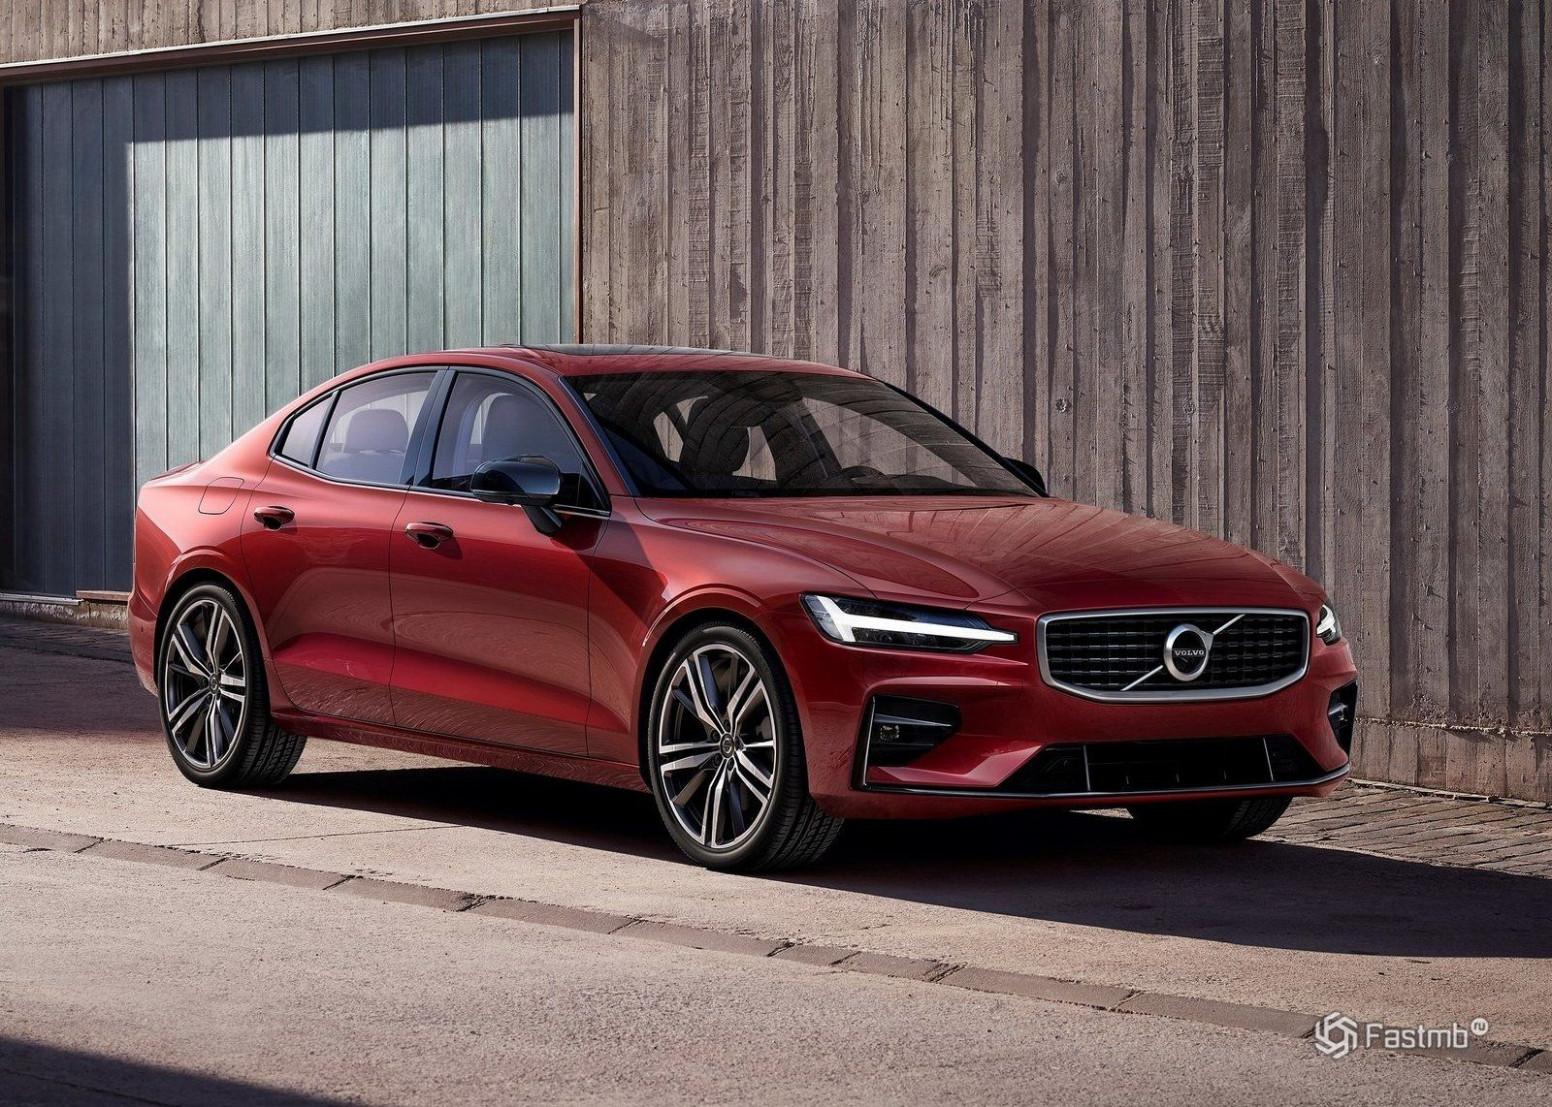 New Concept 2022 Volvo S60